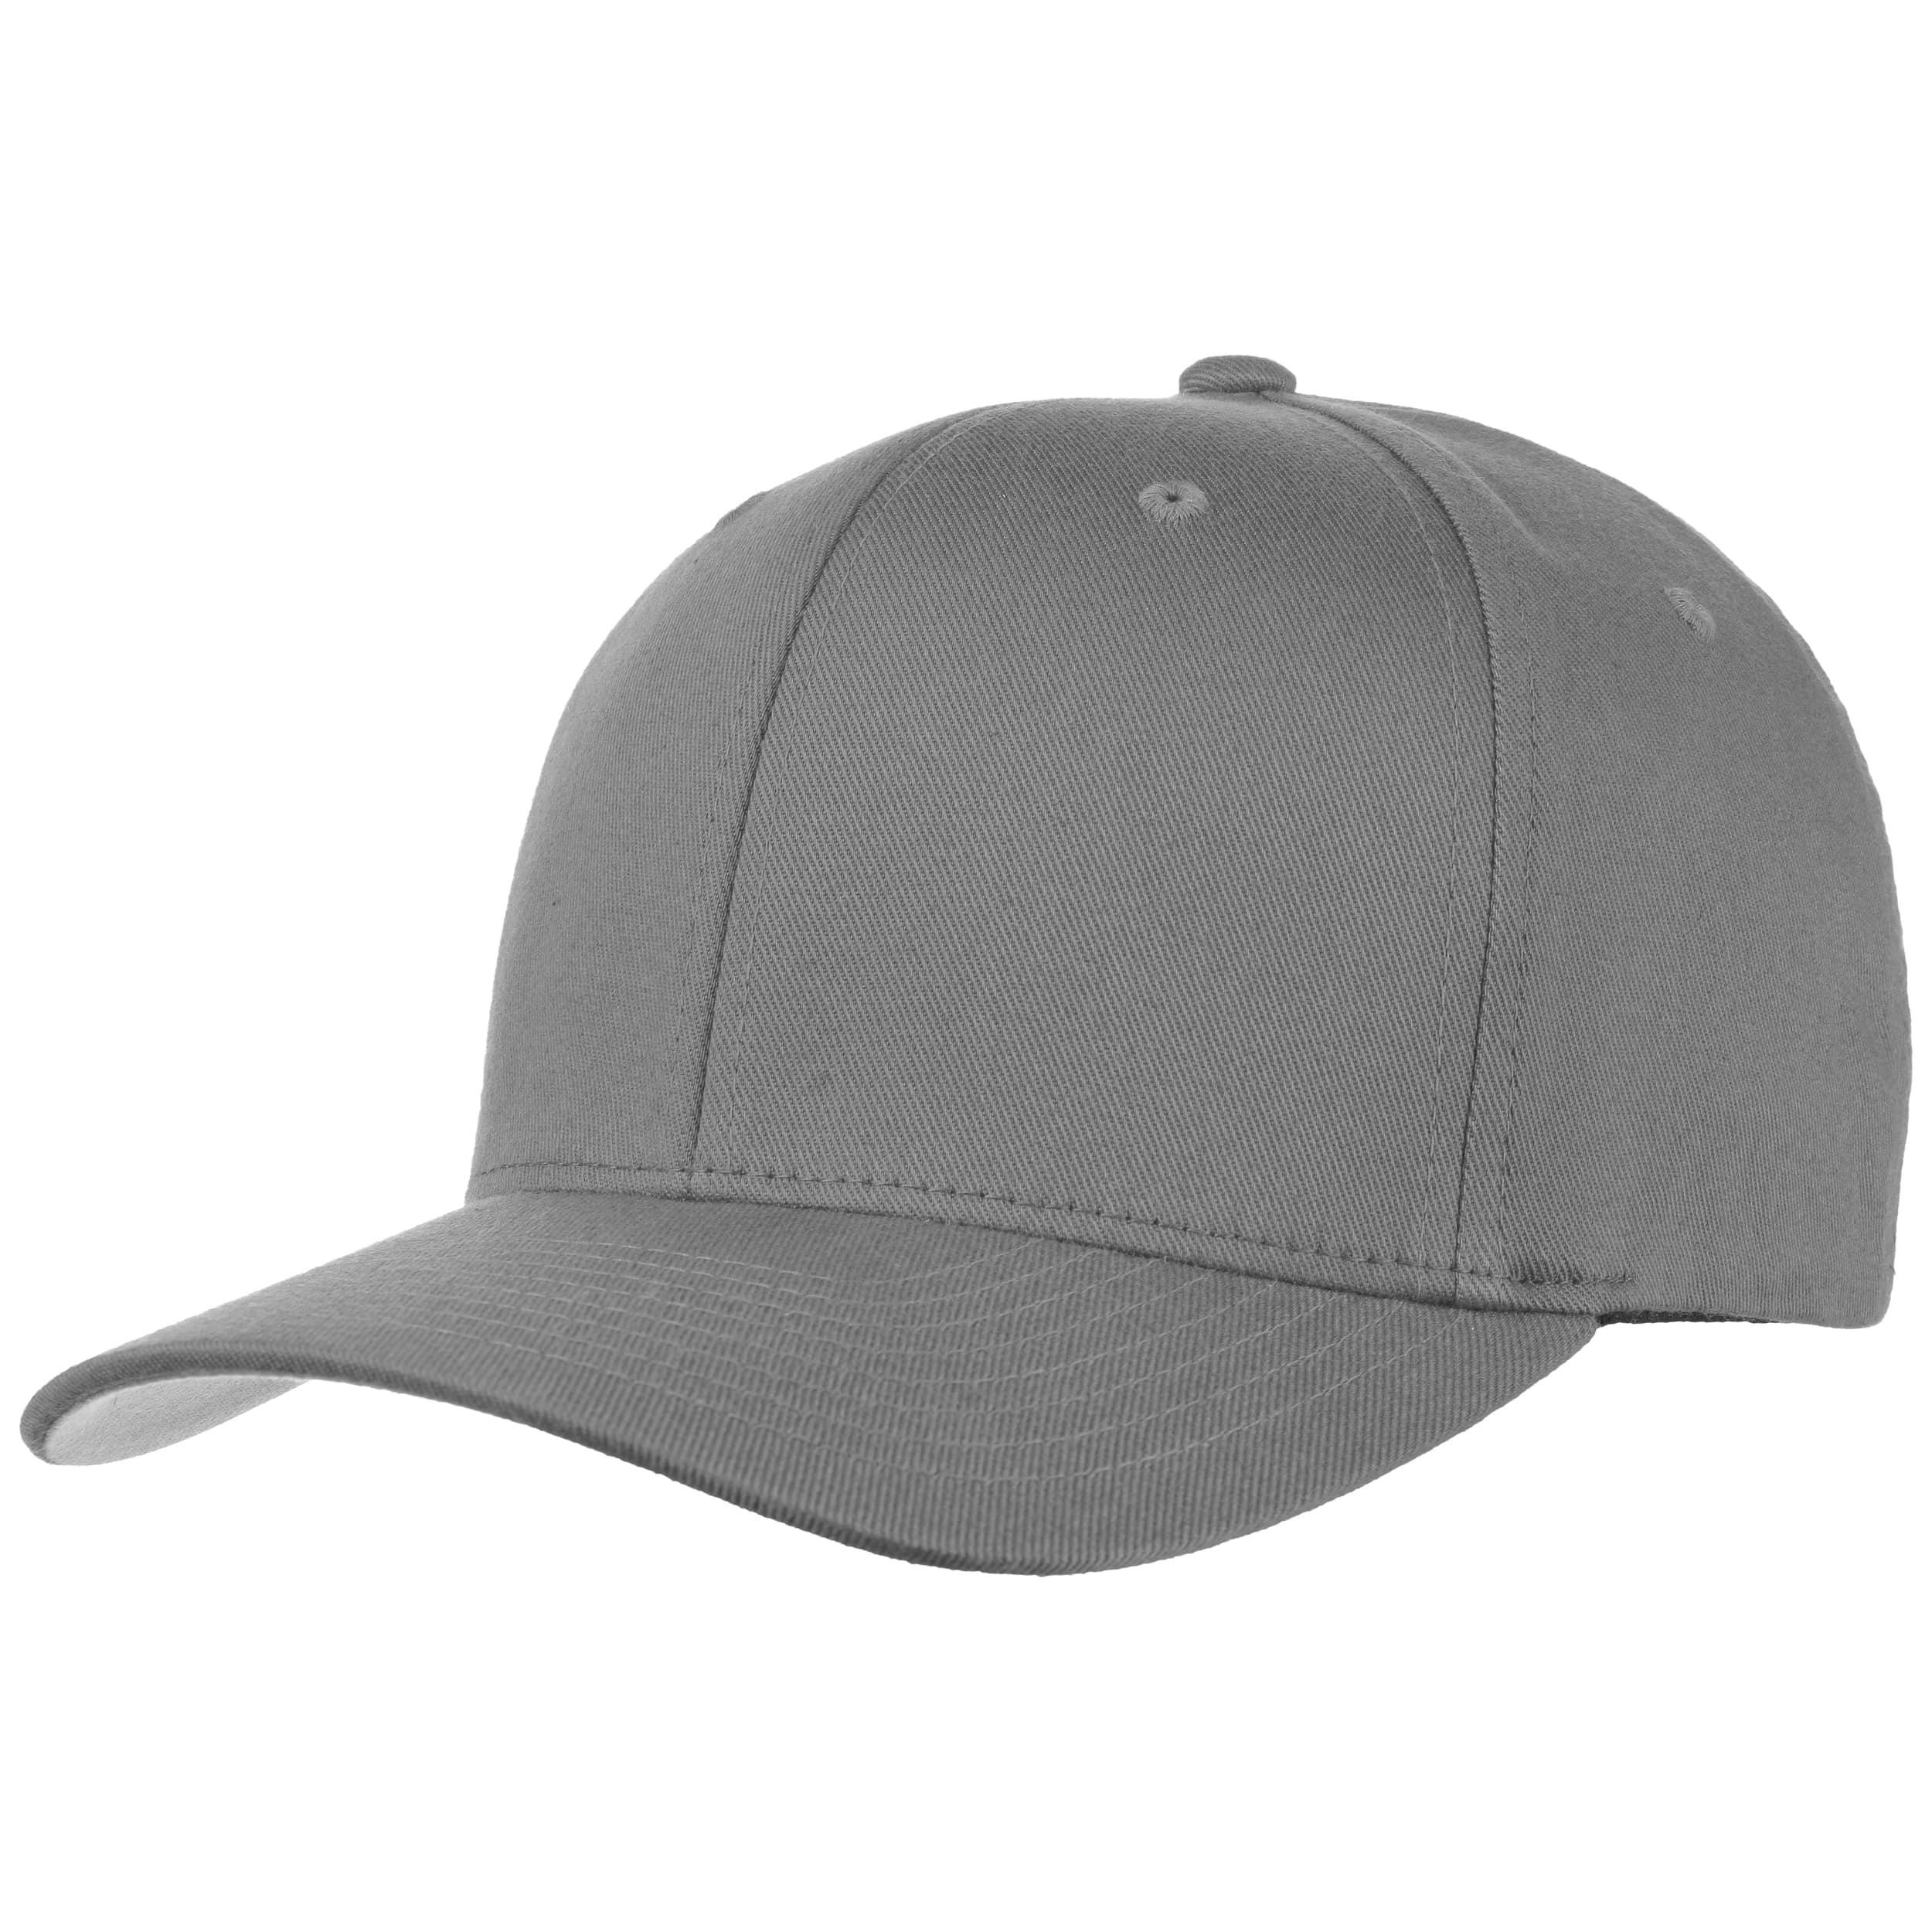 ... Spandex Flexfit Cap - grey 2 ... 01f356ef3e